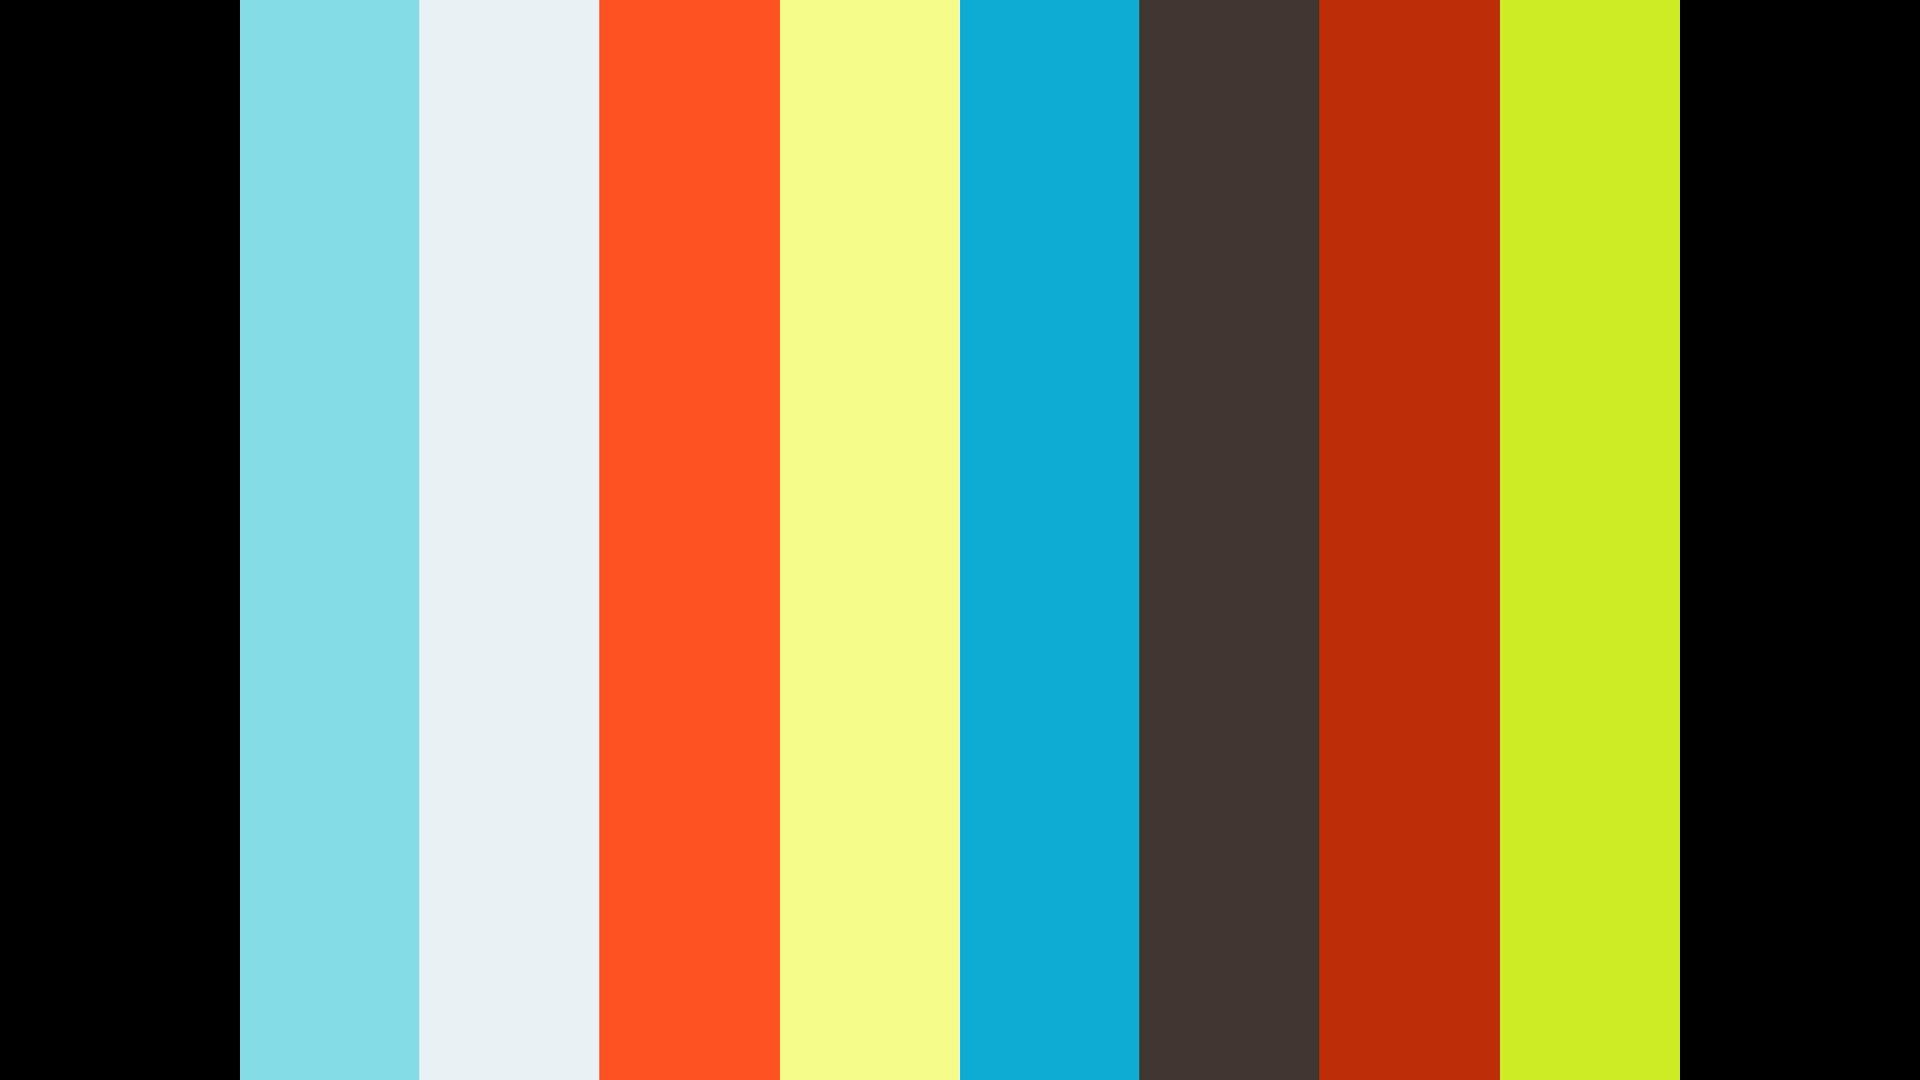 2019-05-28 UBS_Spot_Minimalismus_Master_1920x1080_DE